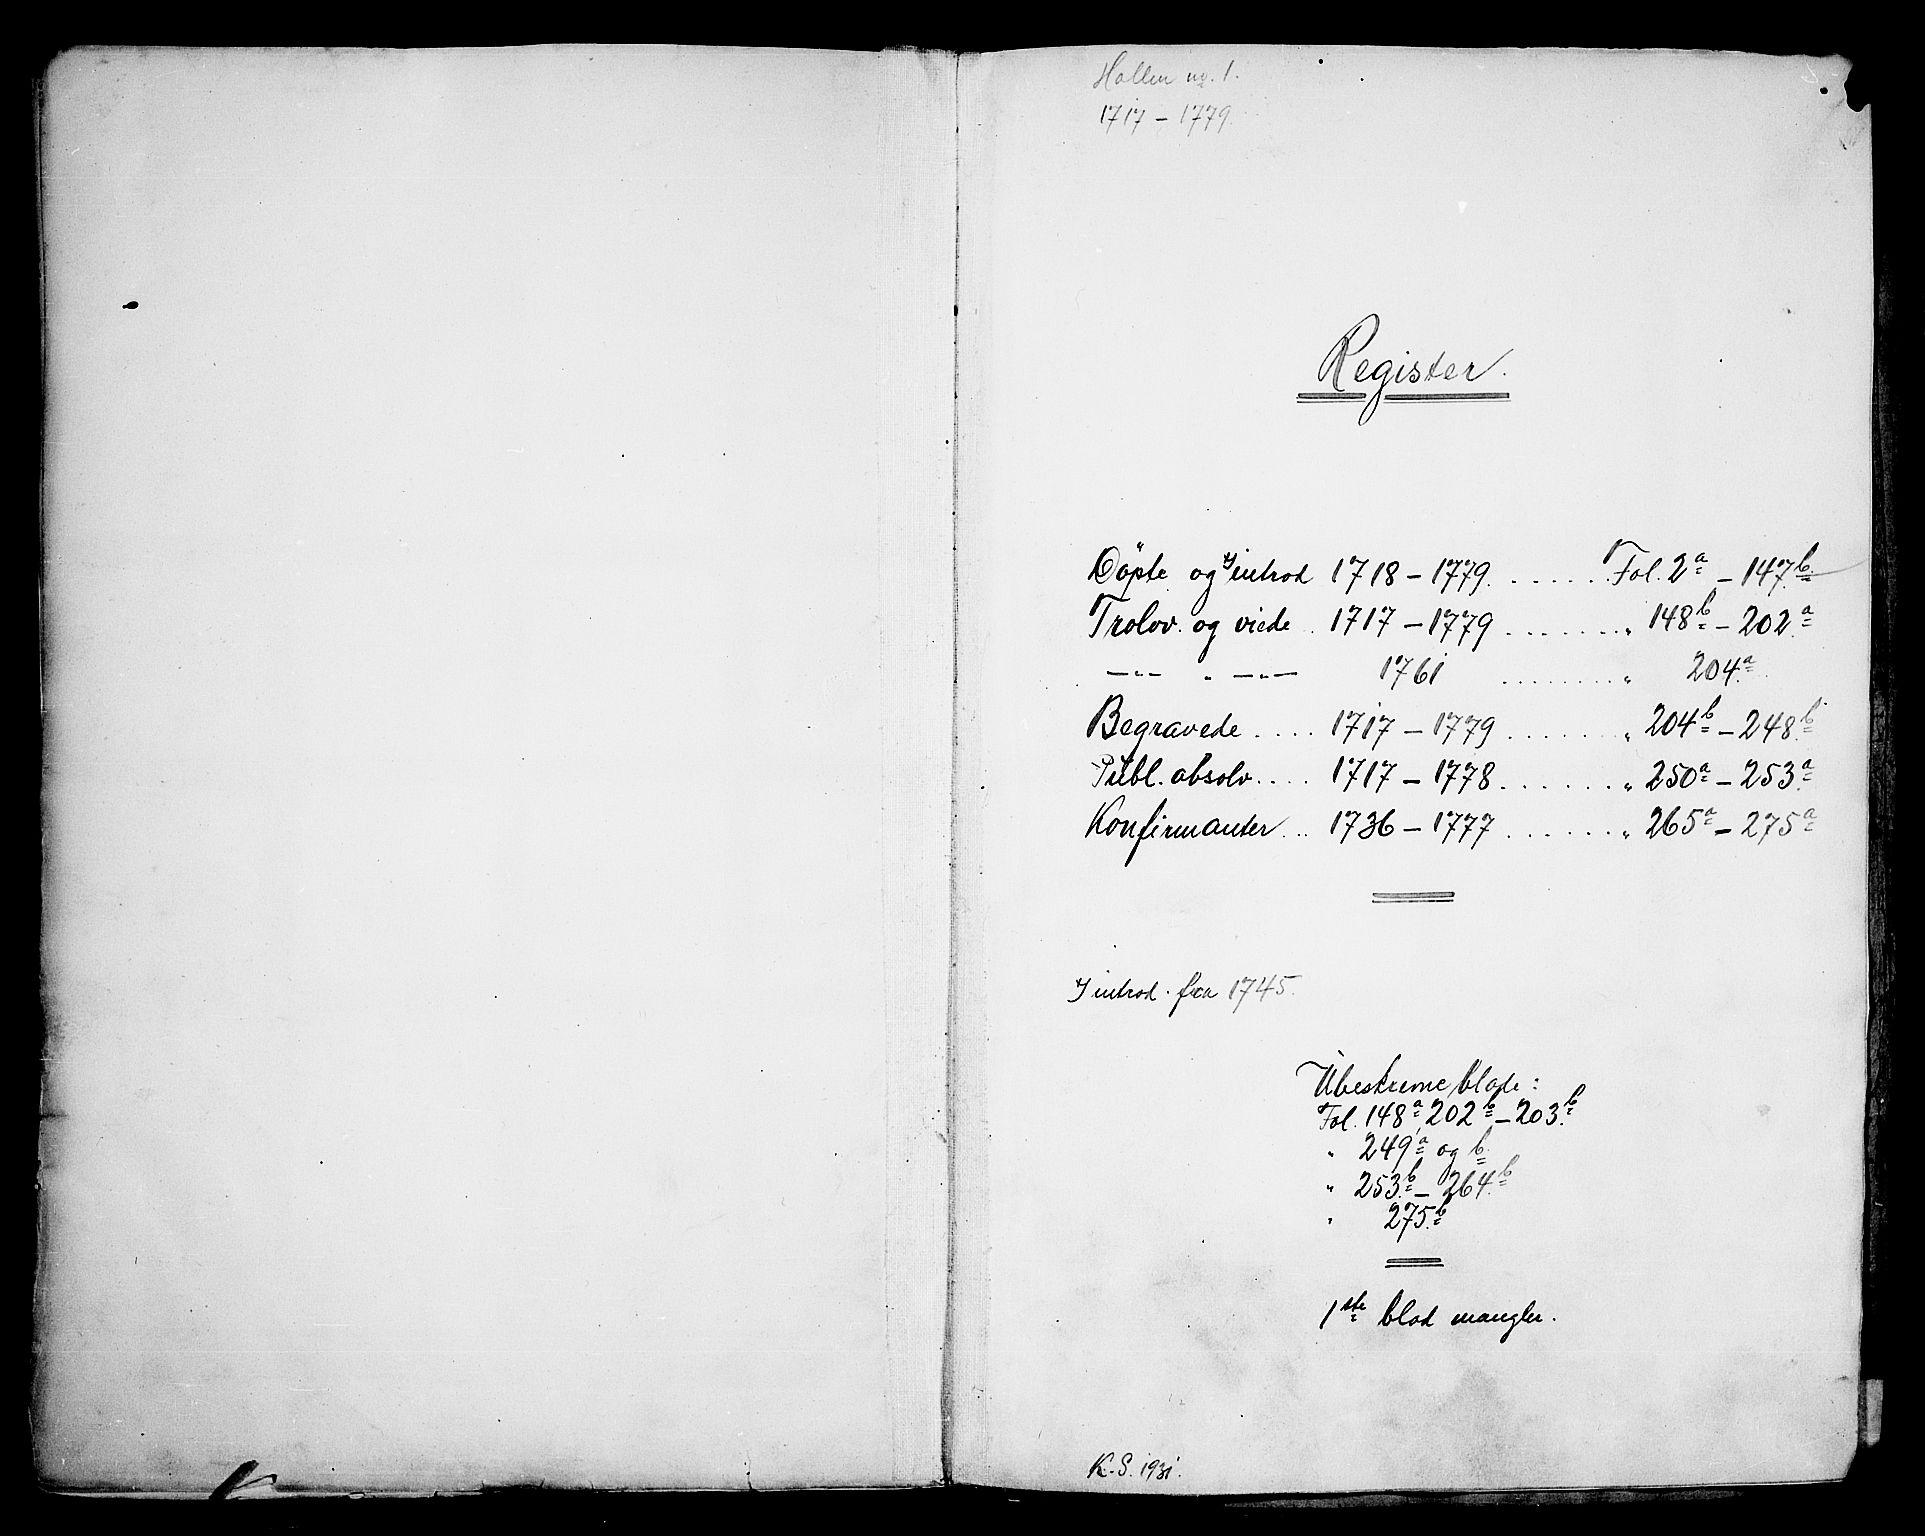 SAKO, Holla kirkebøker, F/Fa/L0001: Ministerialbok nr. 1, 1717-1779